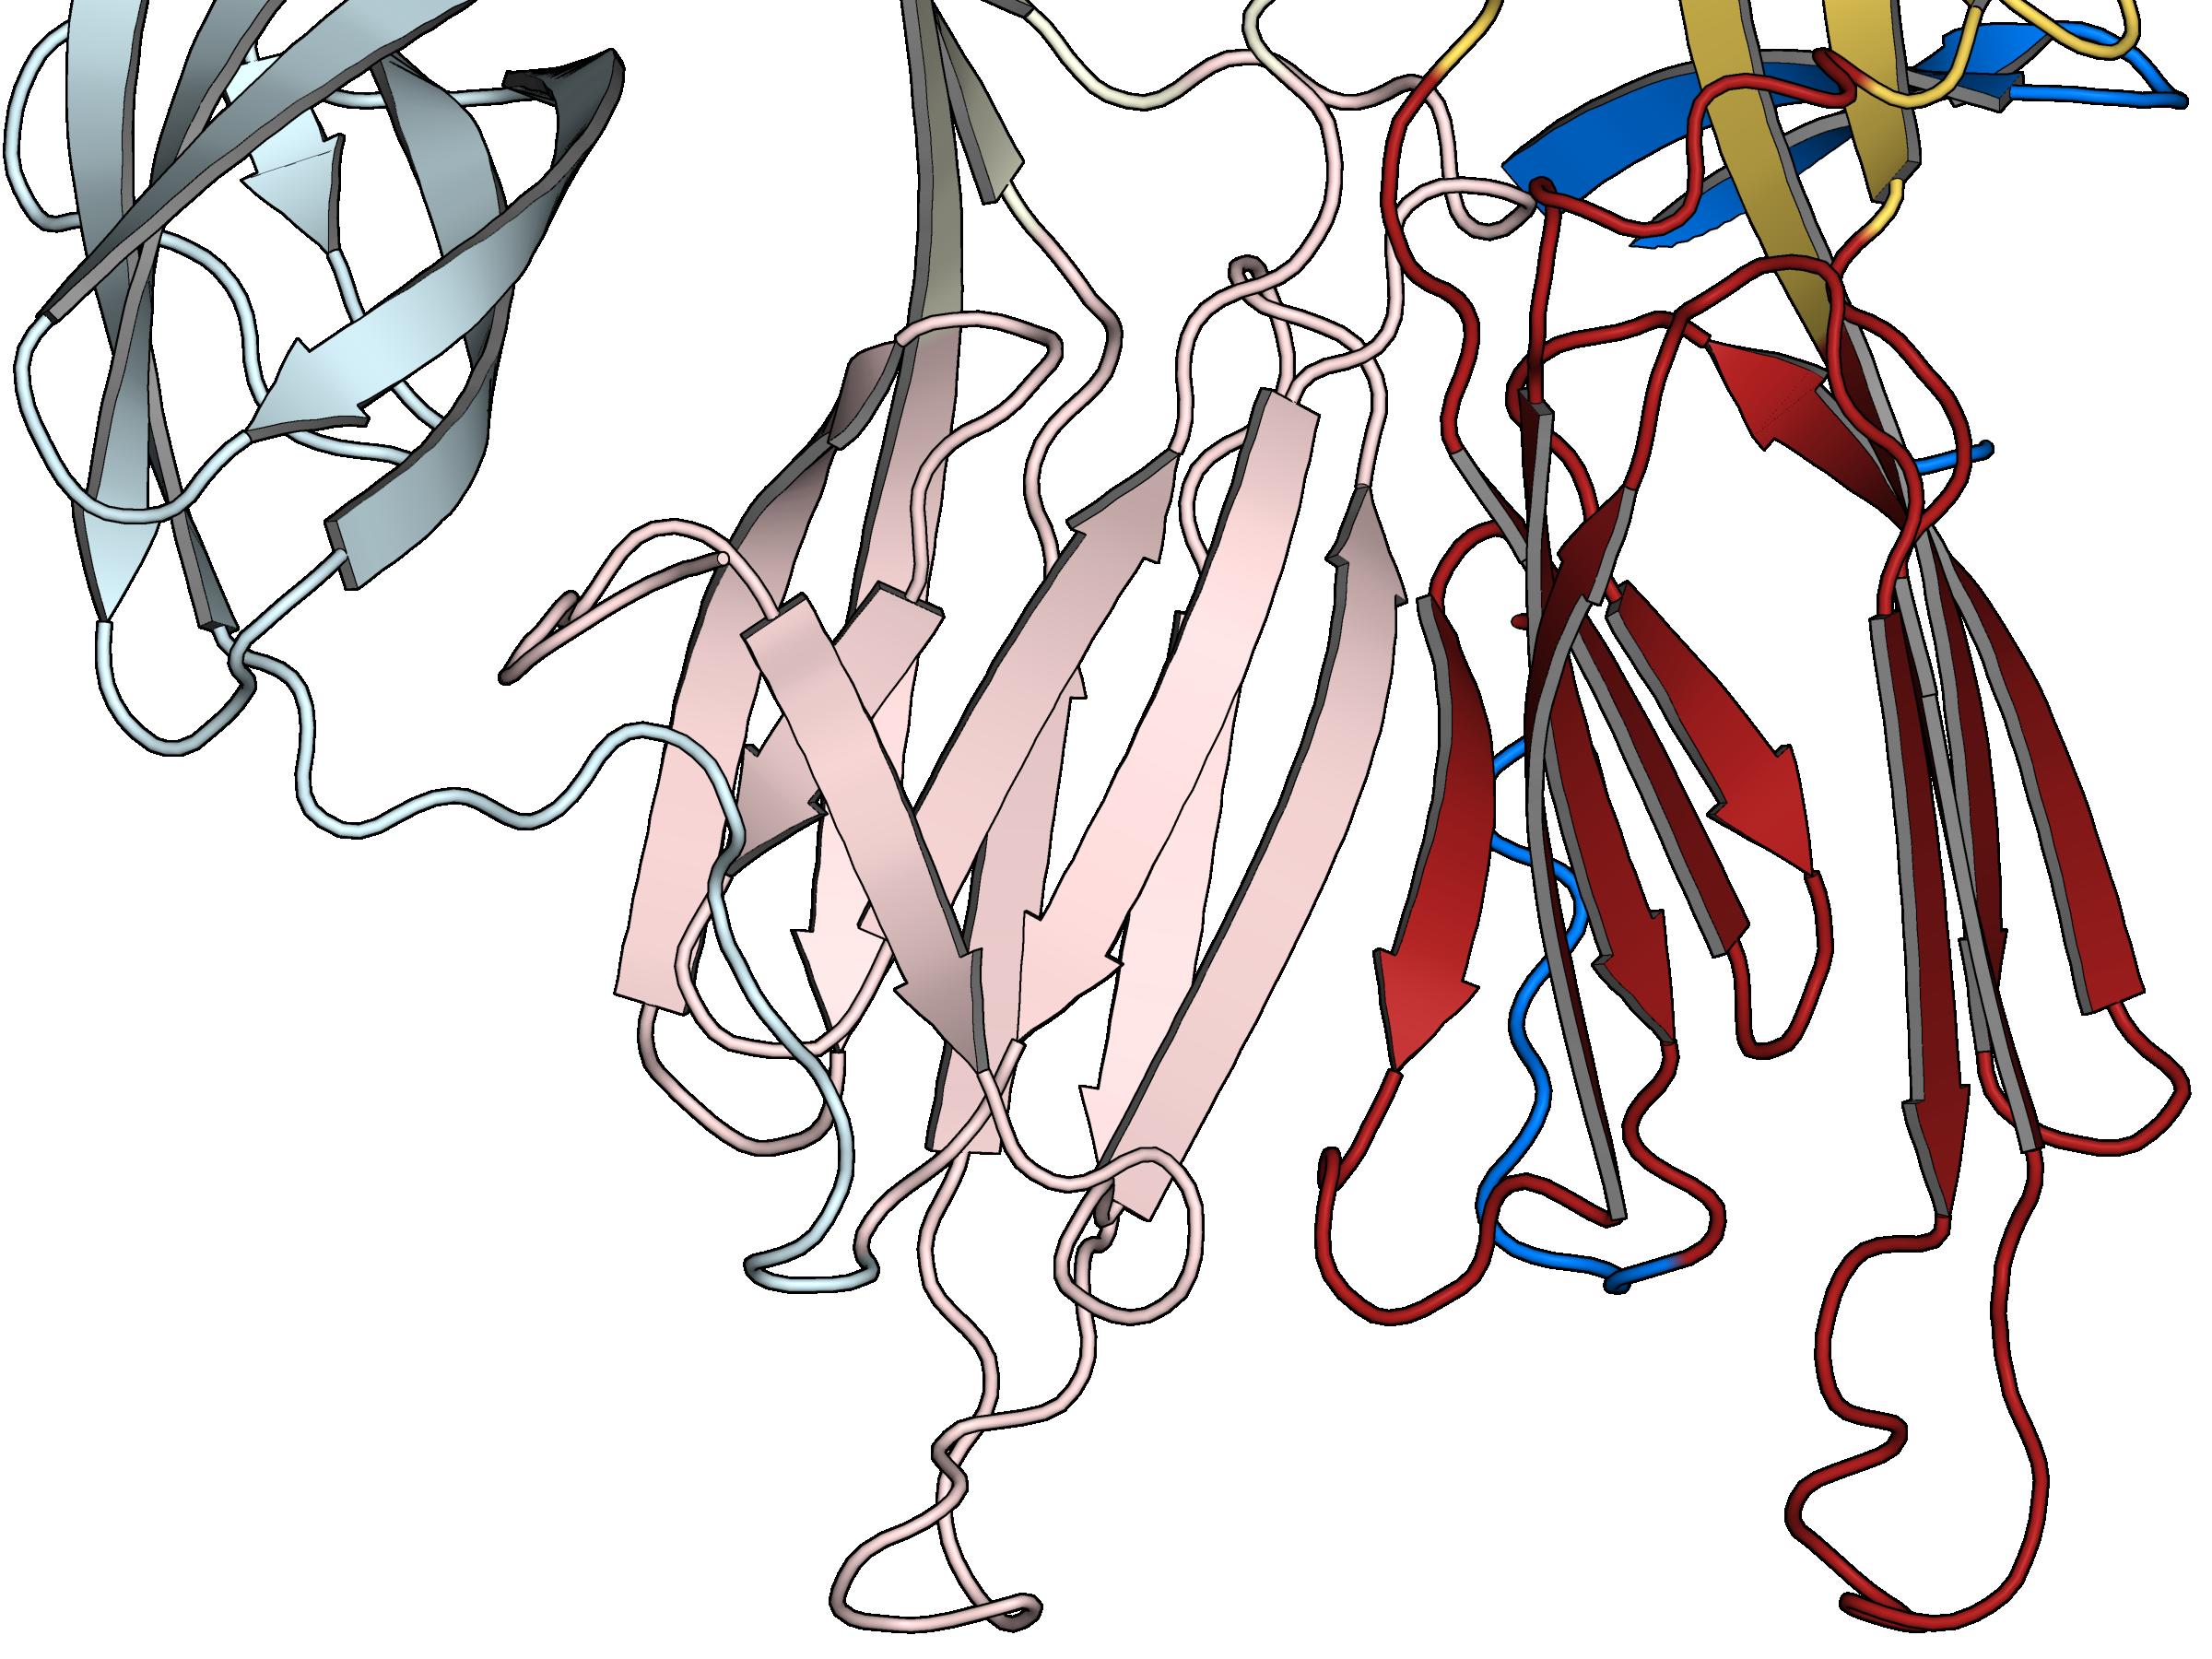 Inter-protomer beta-sheet